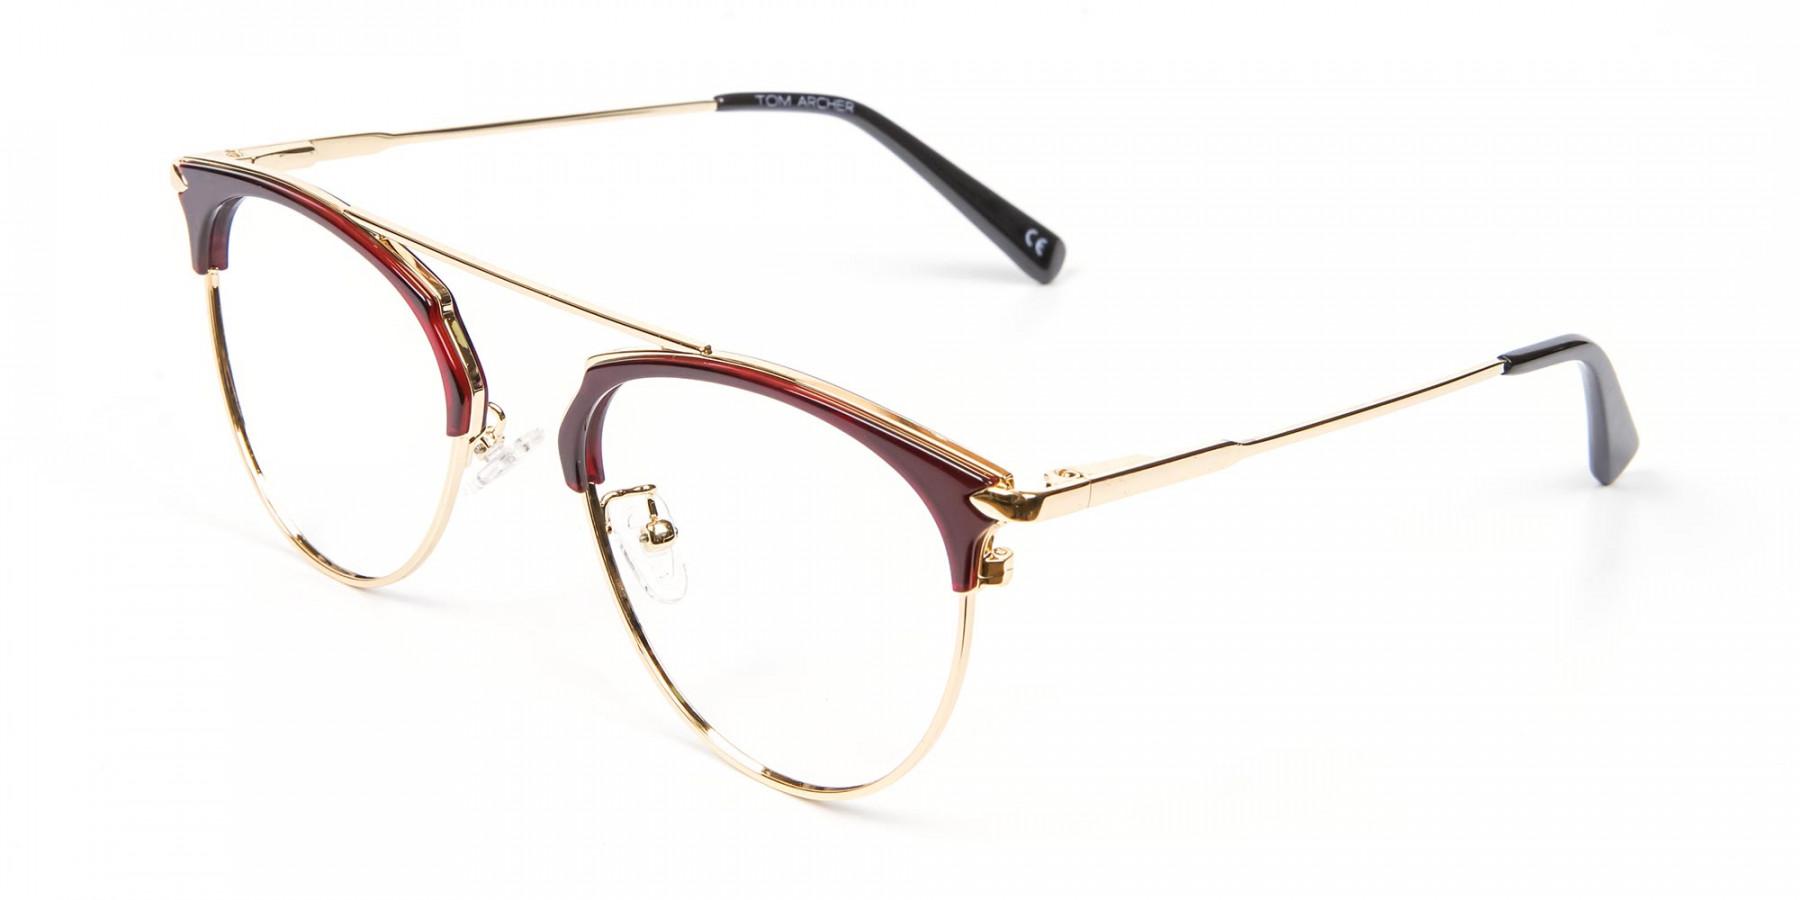 Unique Style Brown Glasses - 1